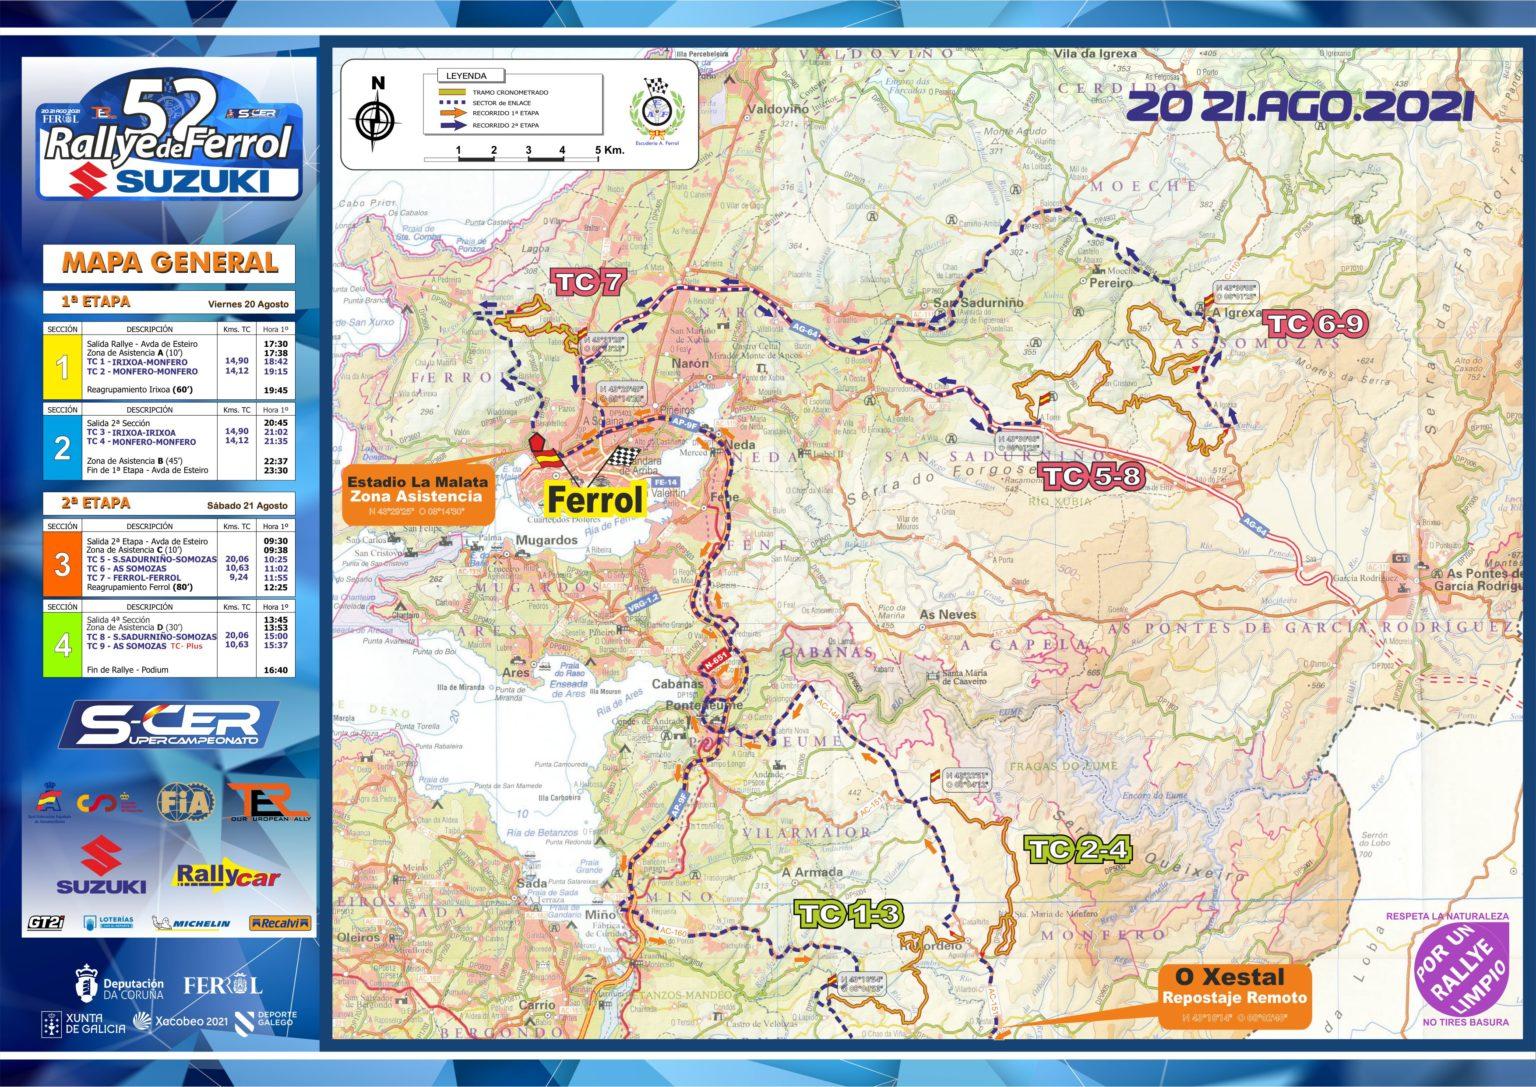 SCER + TER: 52º Rallye de Ferrol - Suzuki [20-21 Agosto] Mapa-A3_LR-1536x1087